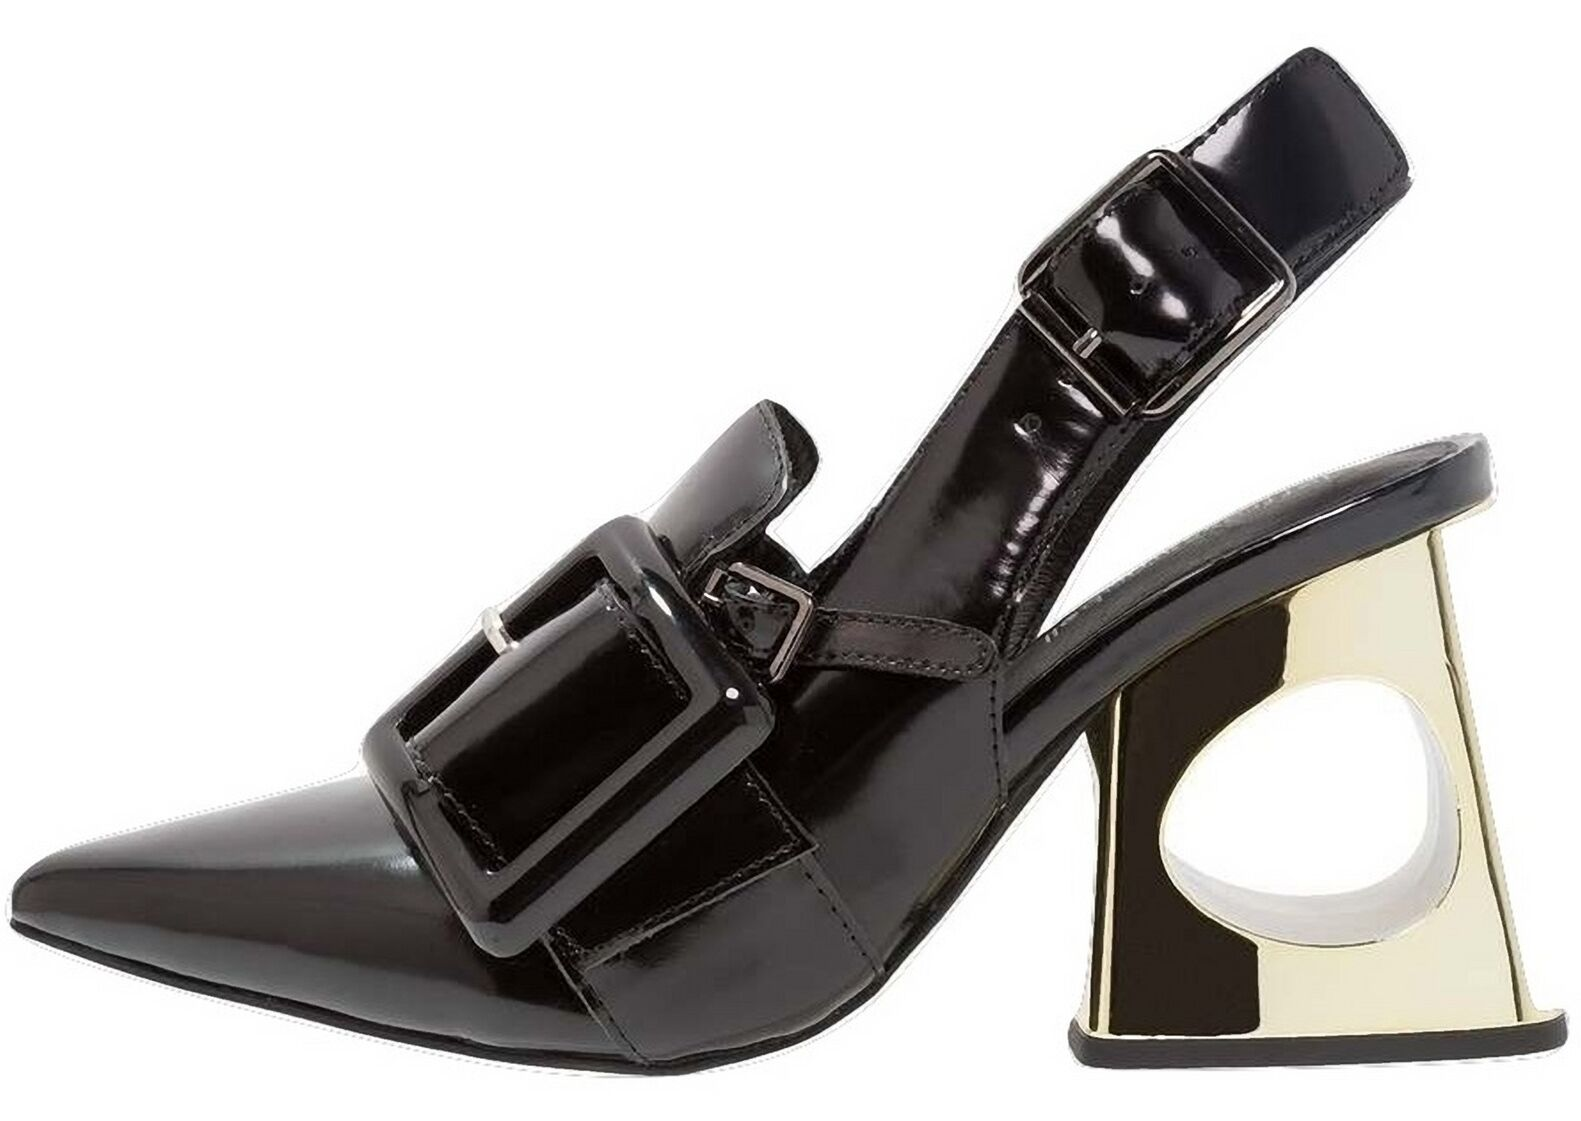 ORIGINALI DELVIDA  JEFFREY CAMPBELL  DELVIDA ORIGINALI BLACK BOX nere sandali scarpe donna tacchi 0d6660